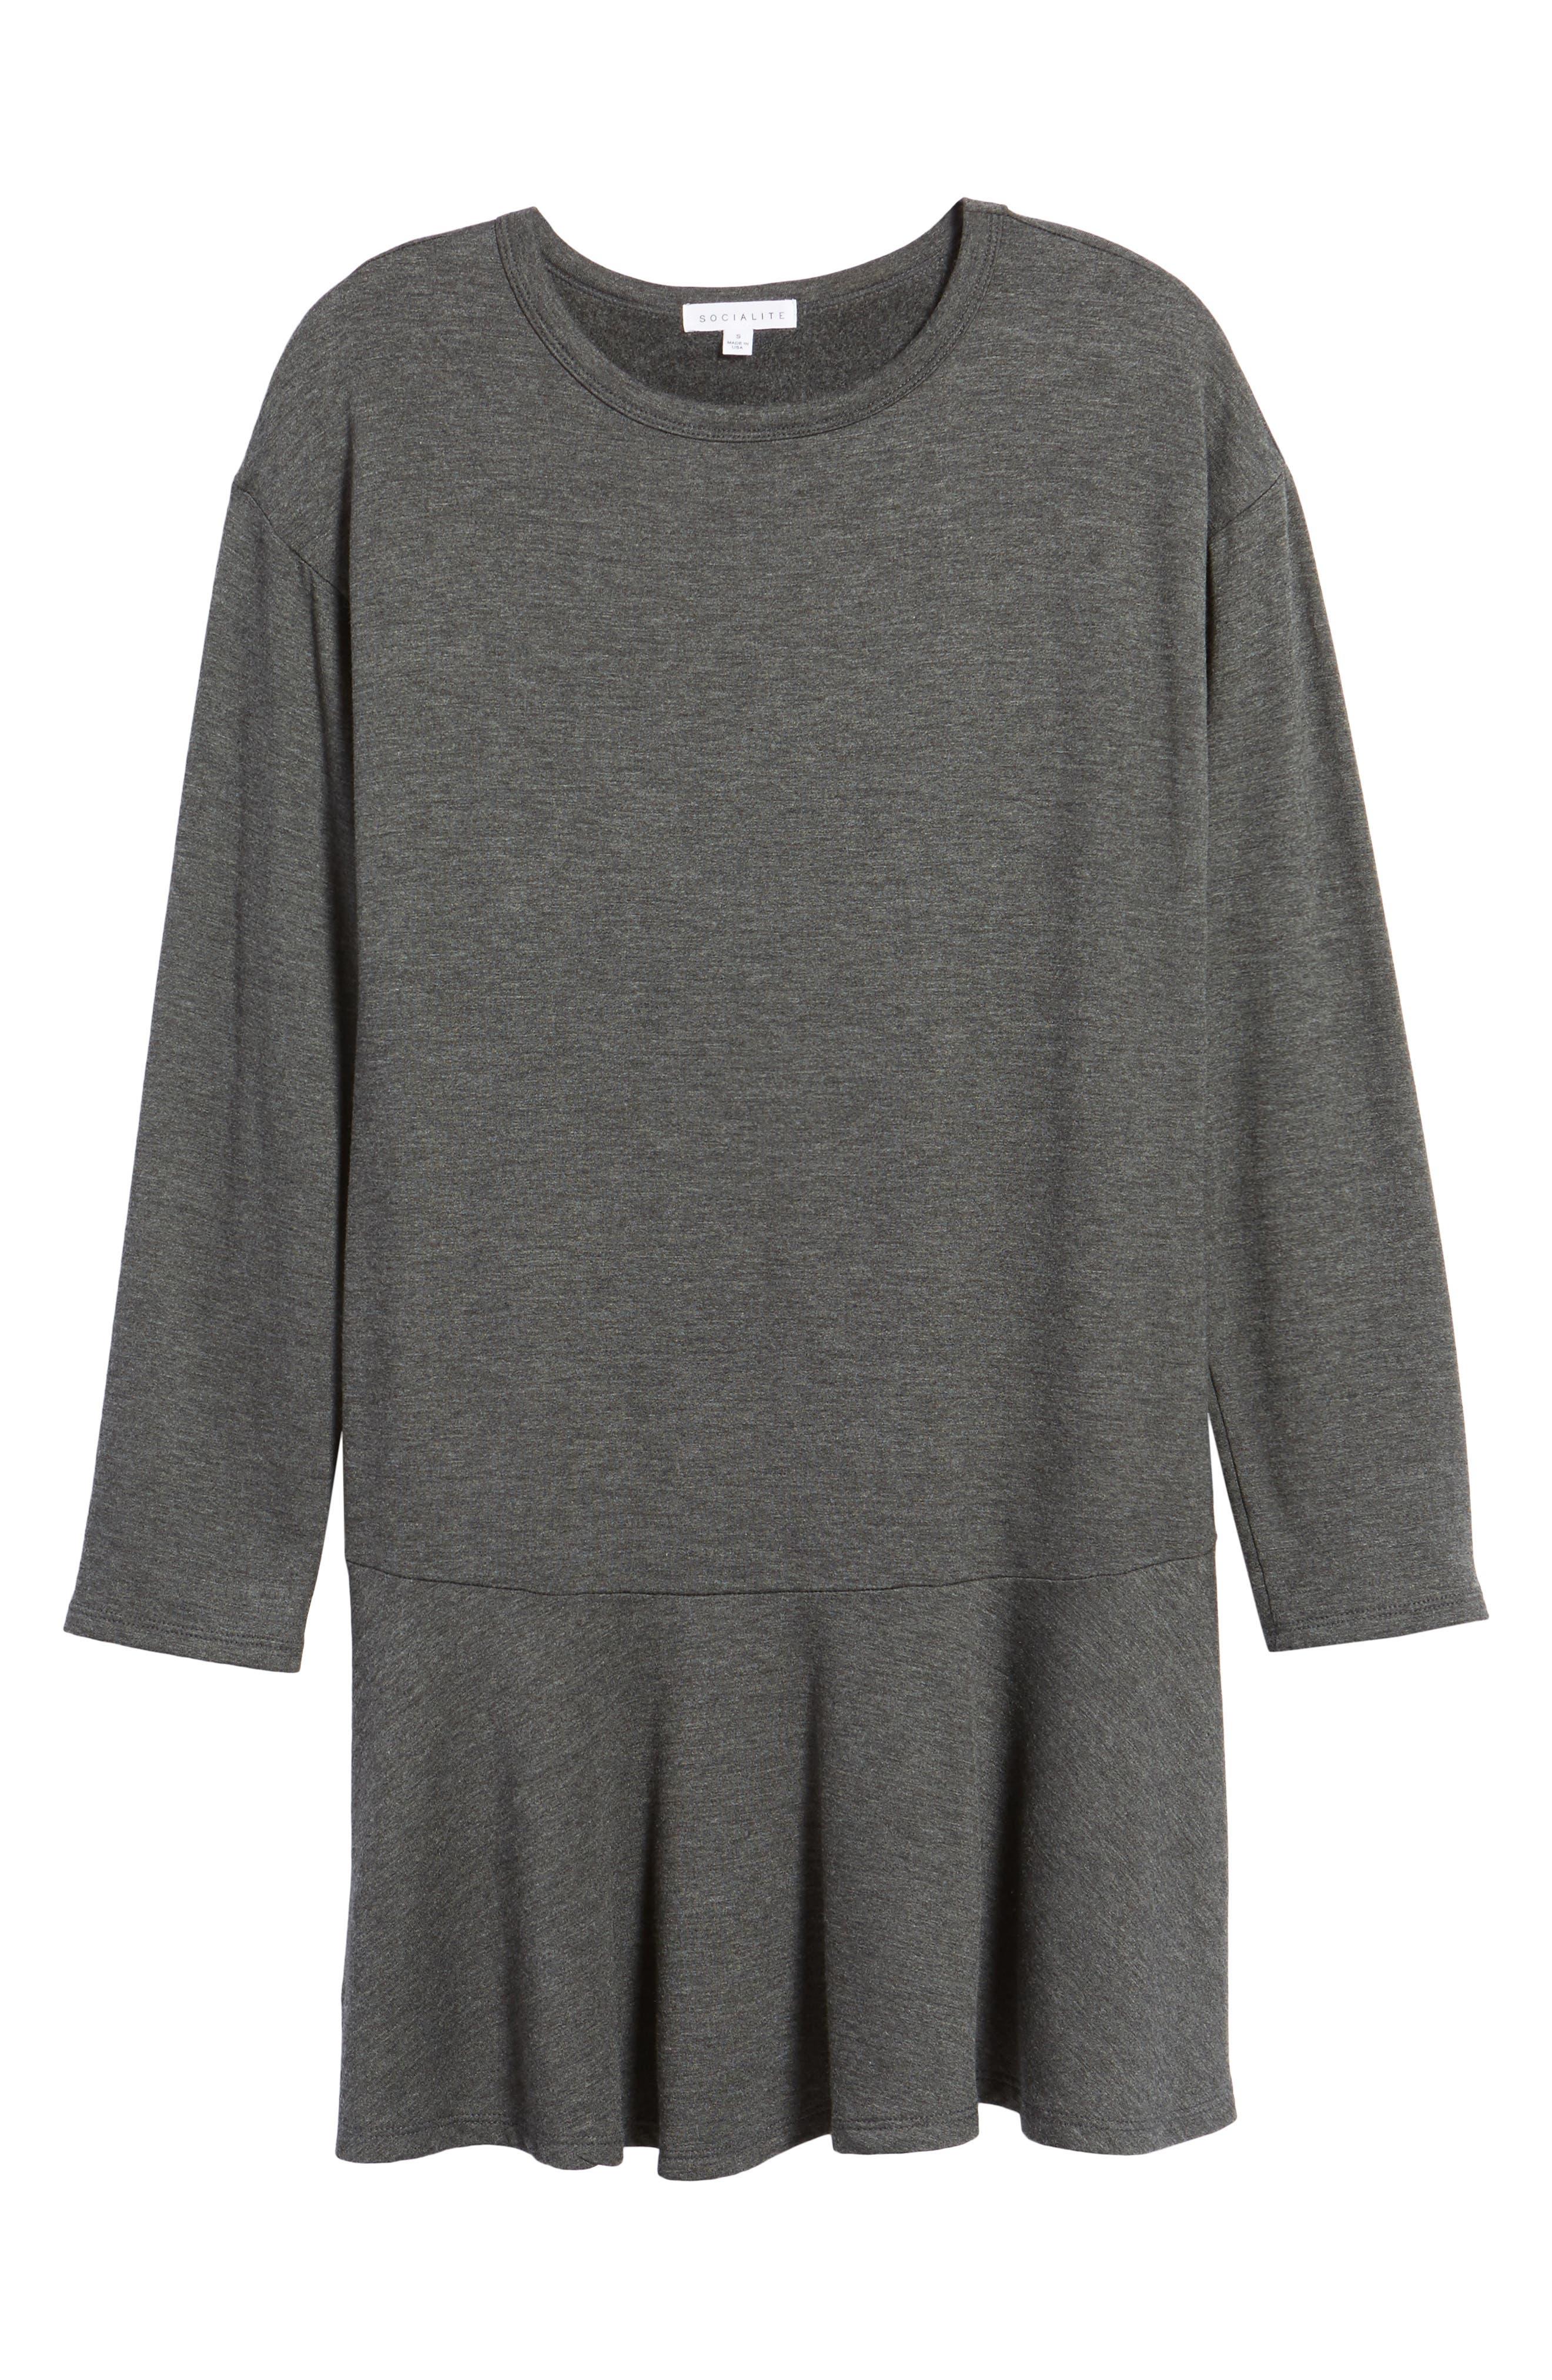 Drop Waist Sweatshirt Dress,                             Alternate thumbnail 6, color,                             020